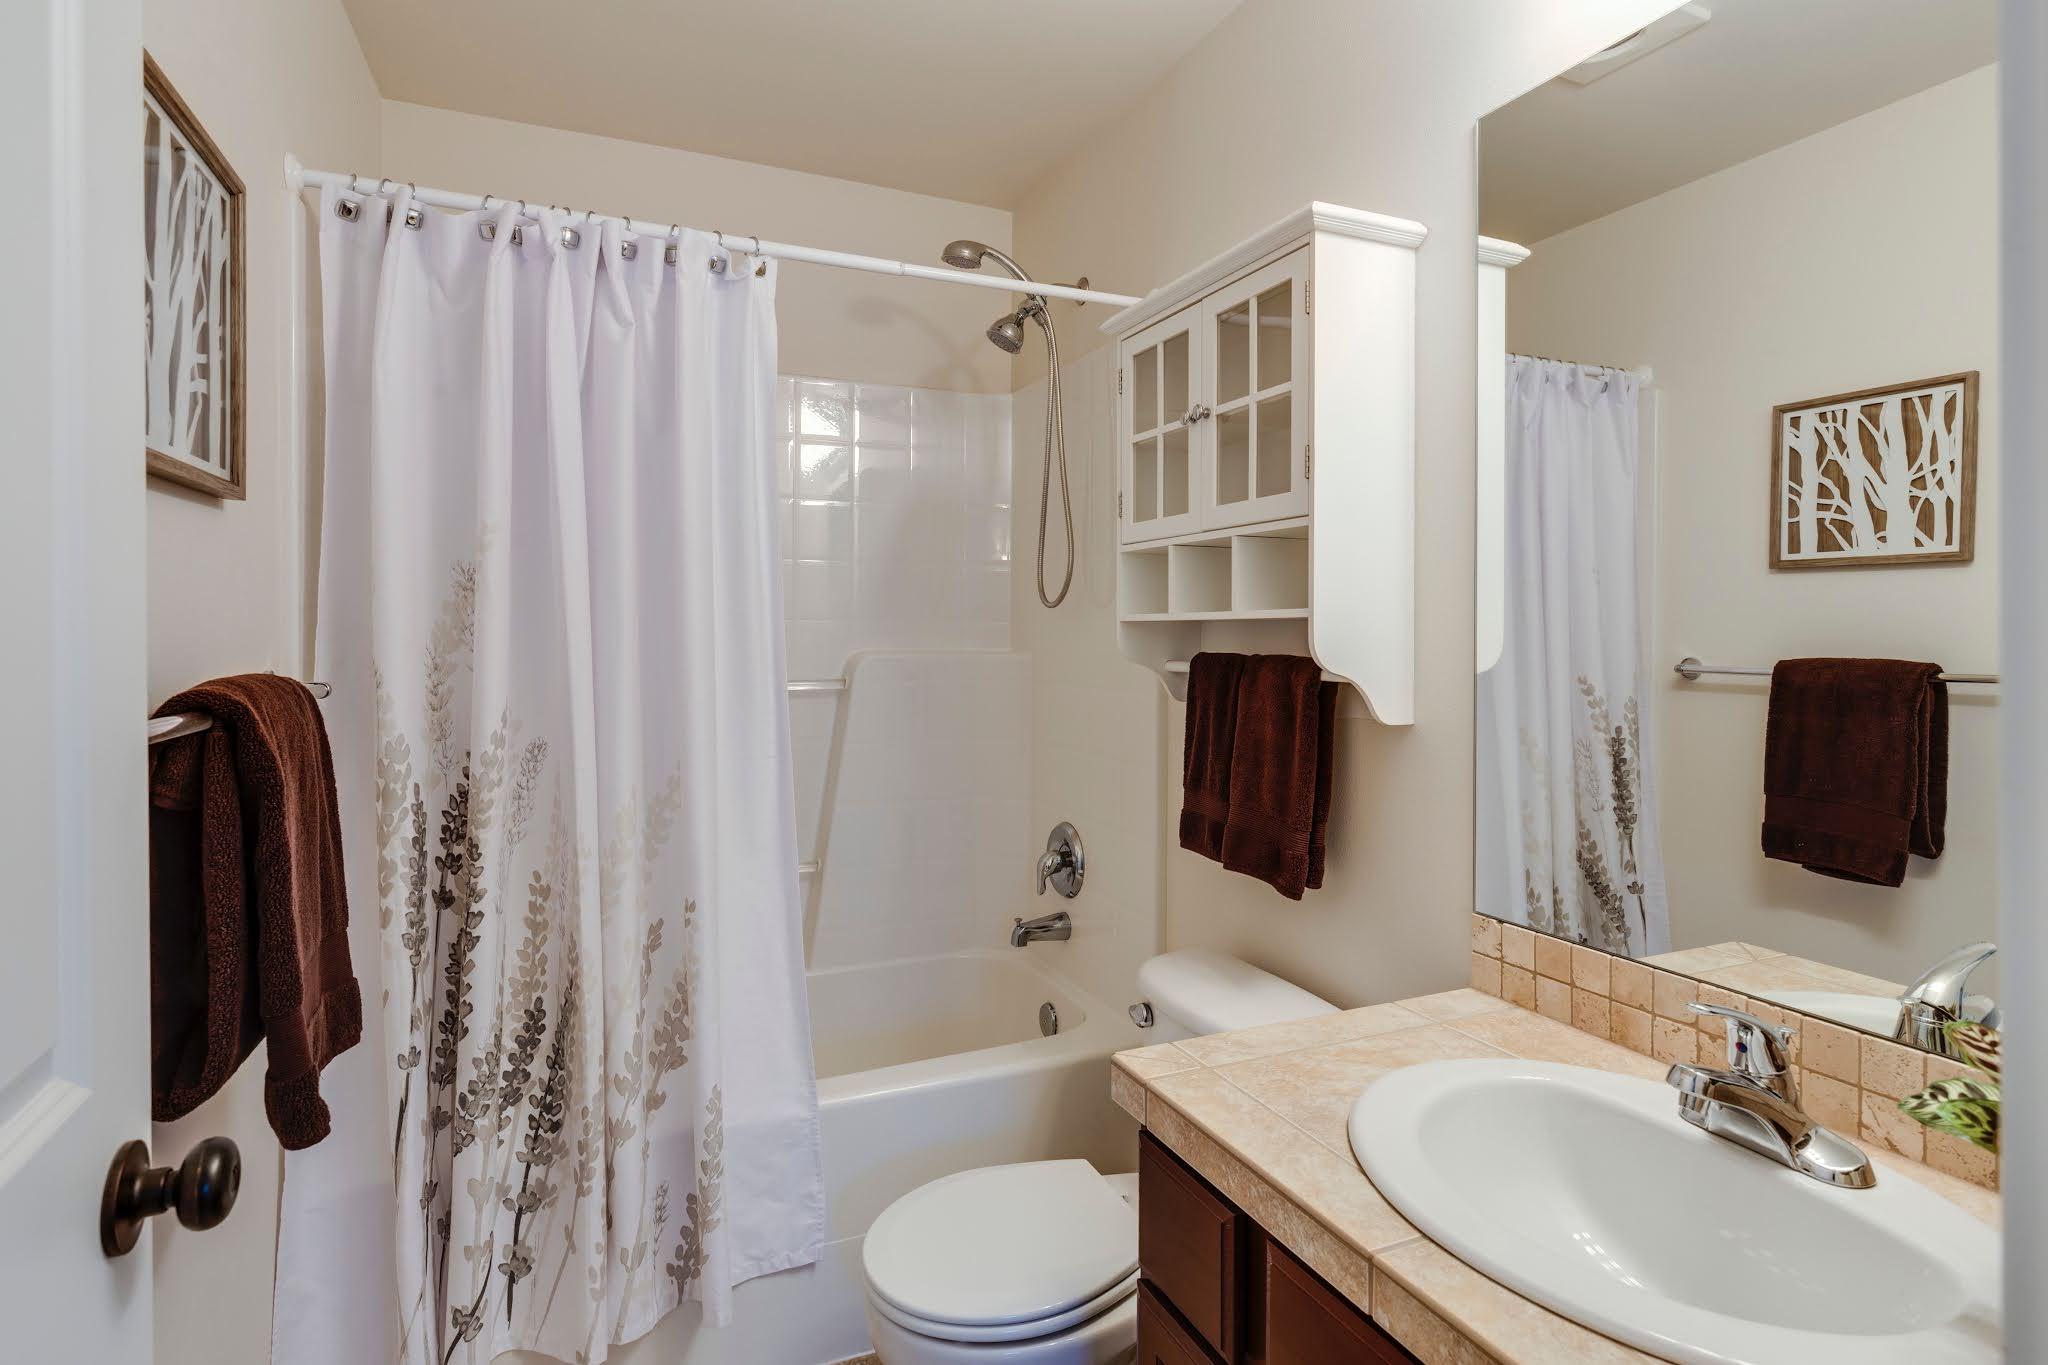 desain kamar mandi minimalis ukuran